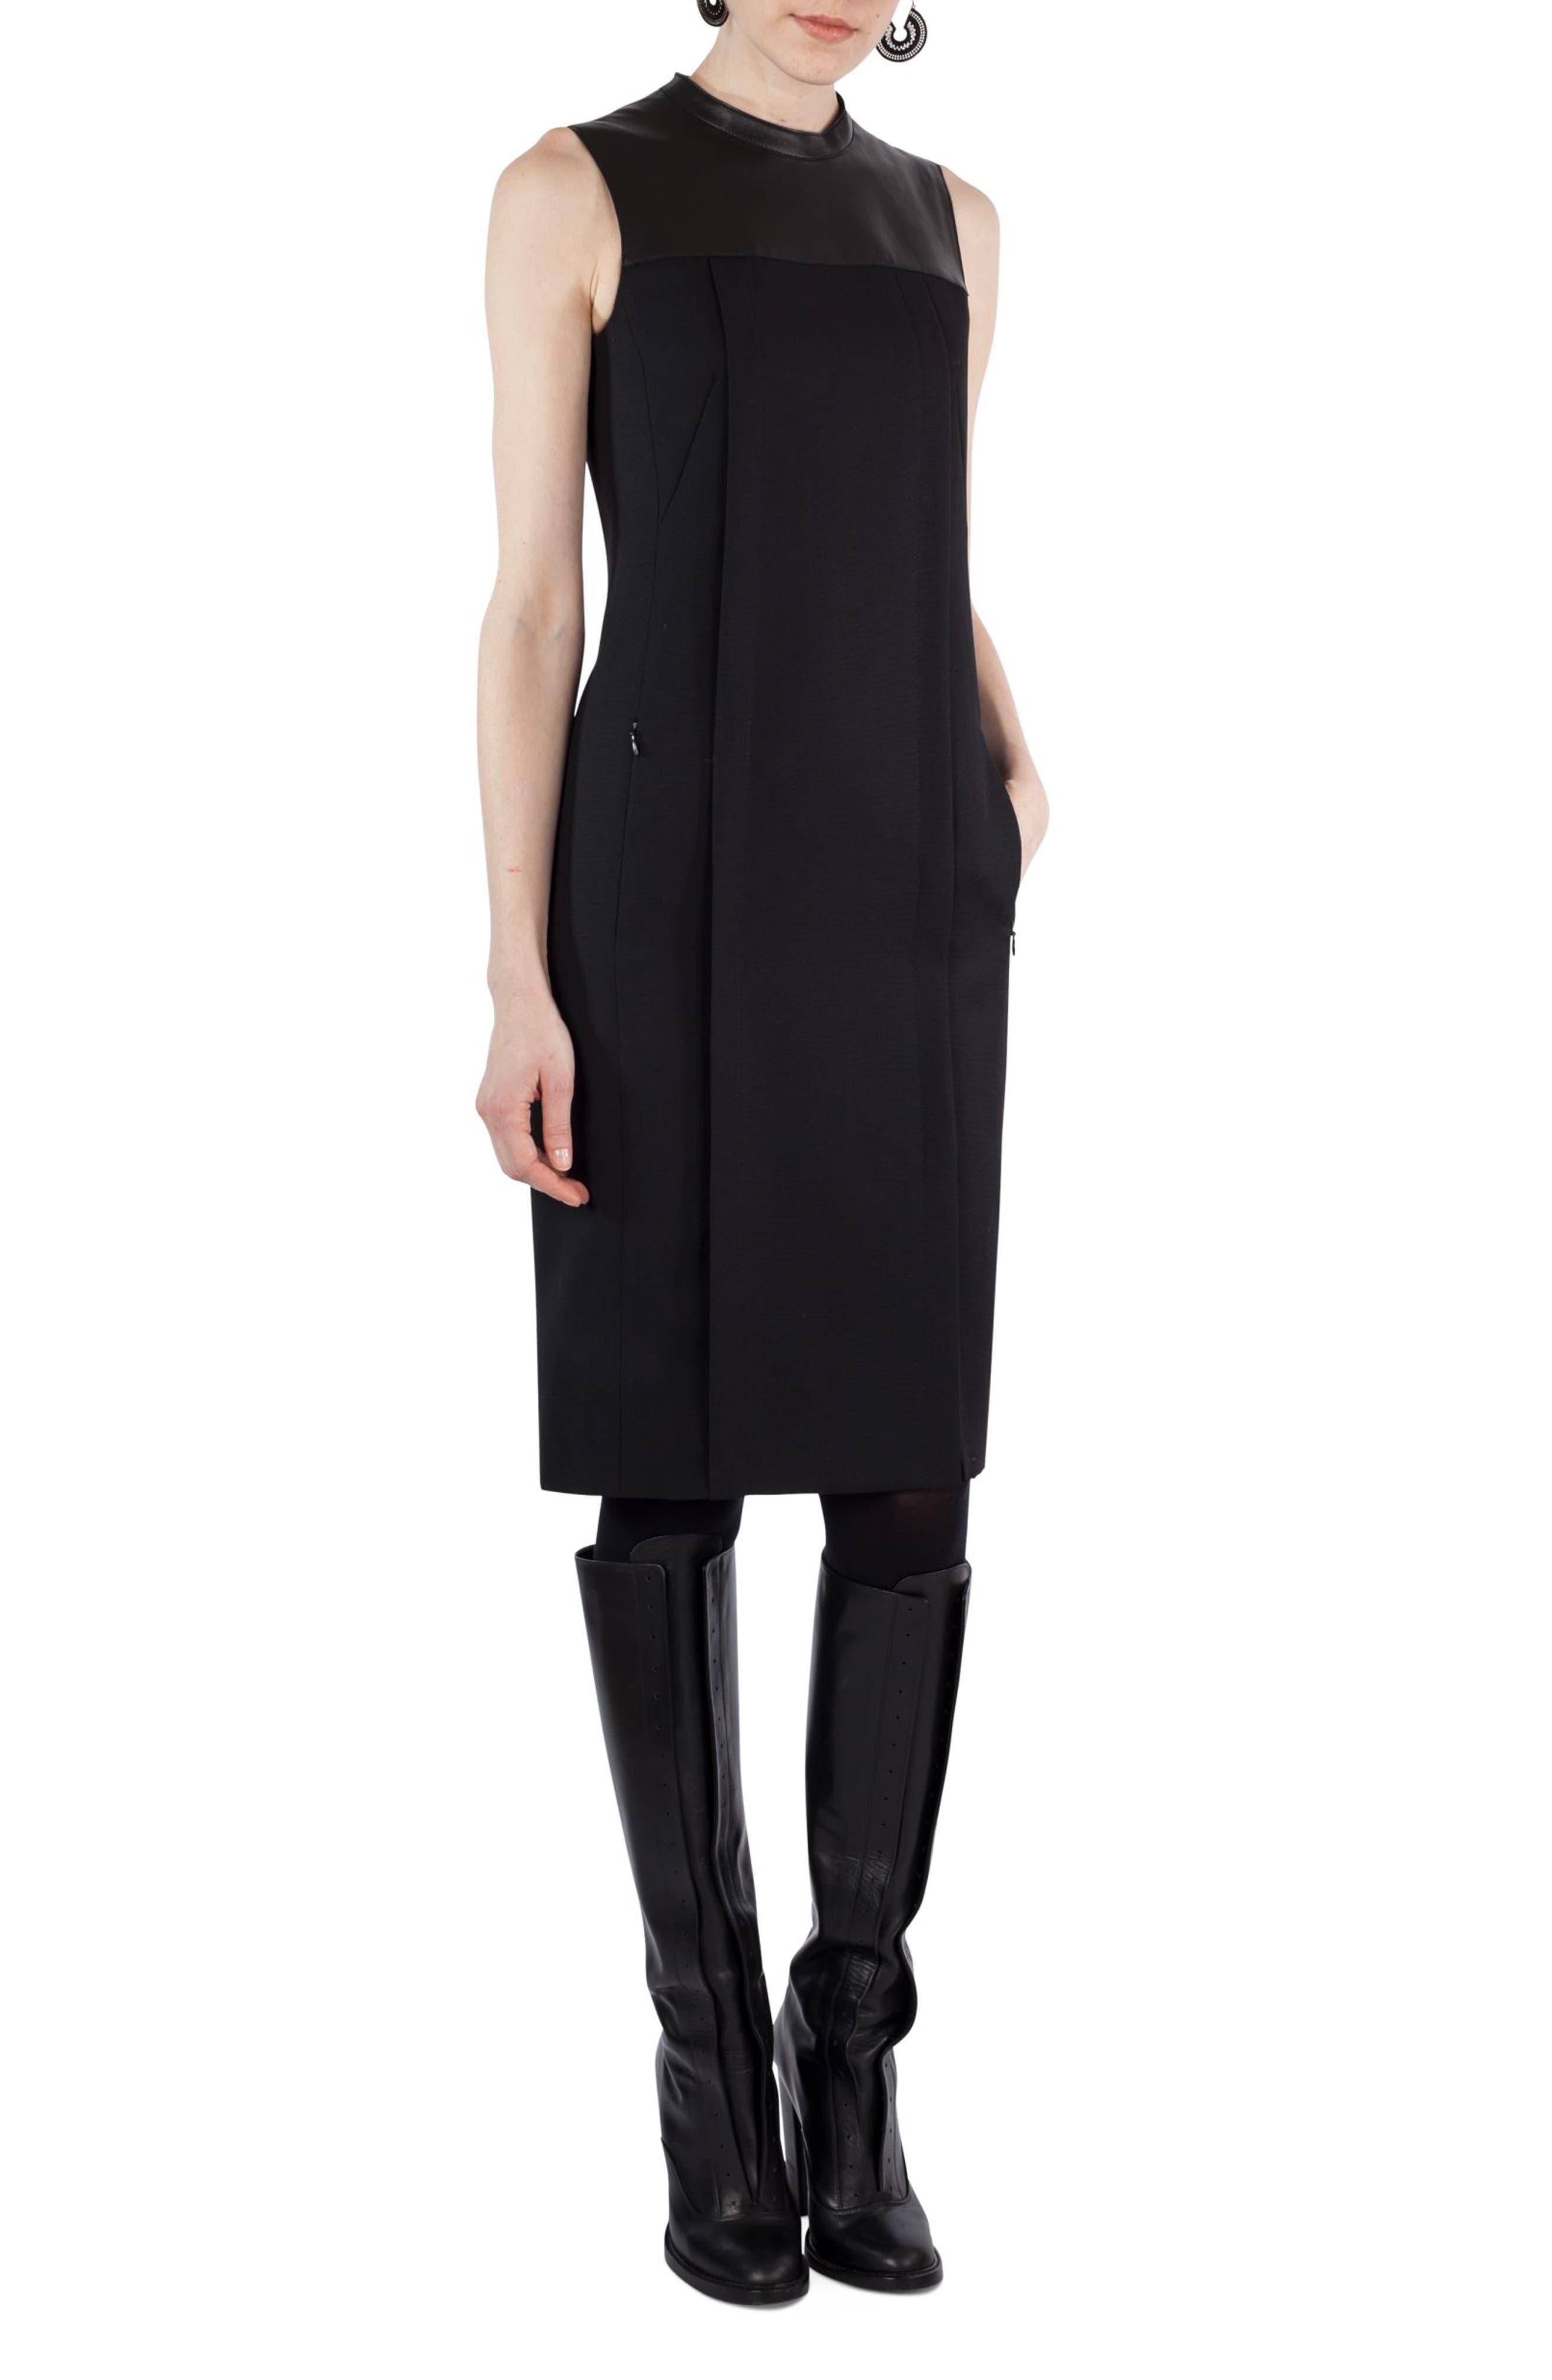 Alternate Image 1 Selected - Akris punto Wool & Leather Shift Dress